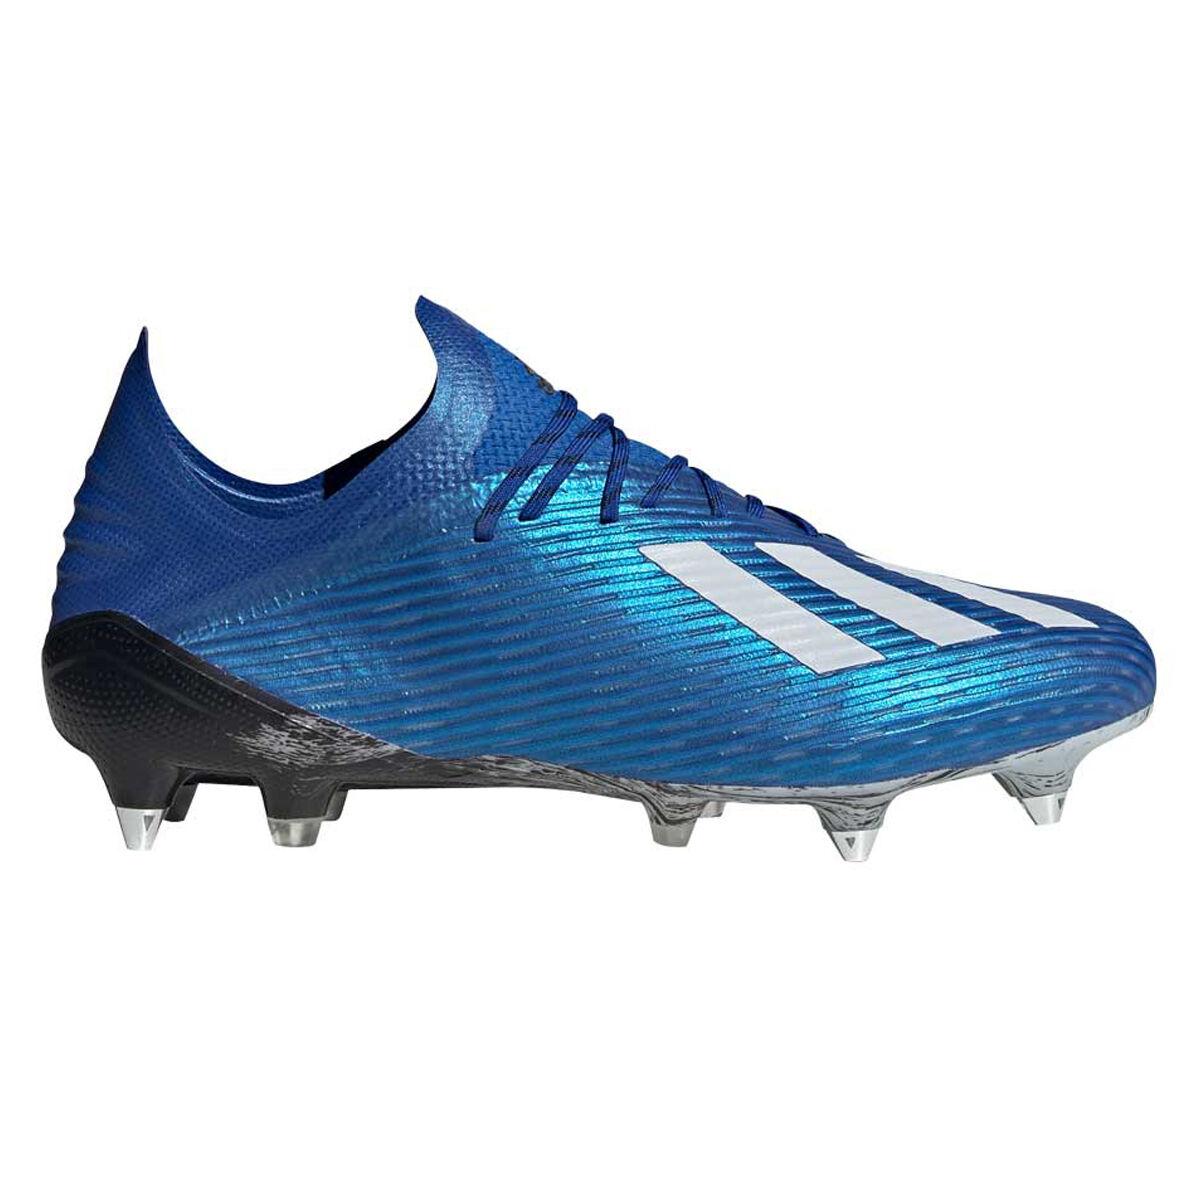 adidas X 19.1 SG Football Boots | Rebel